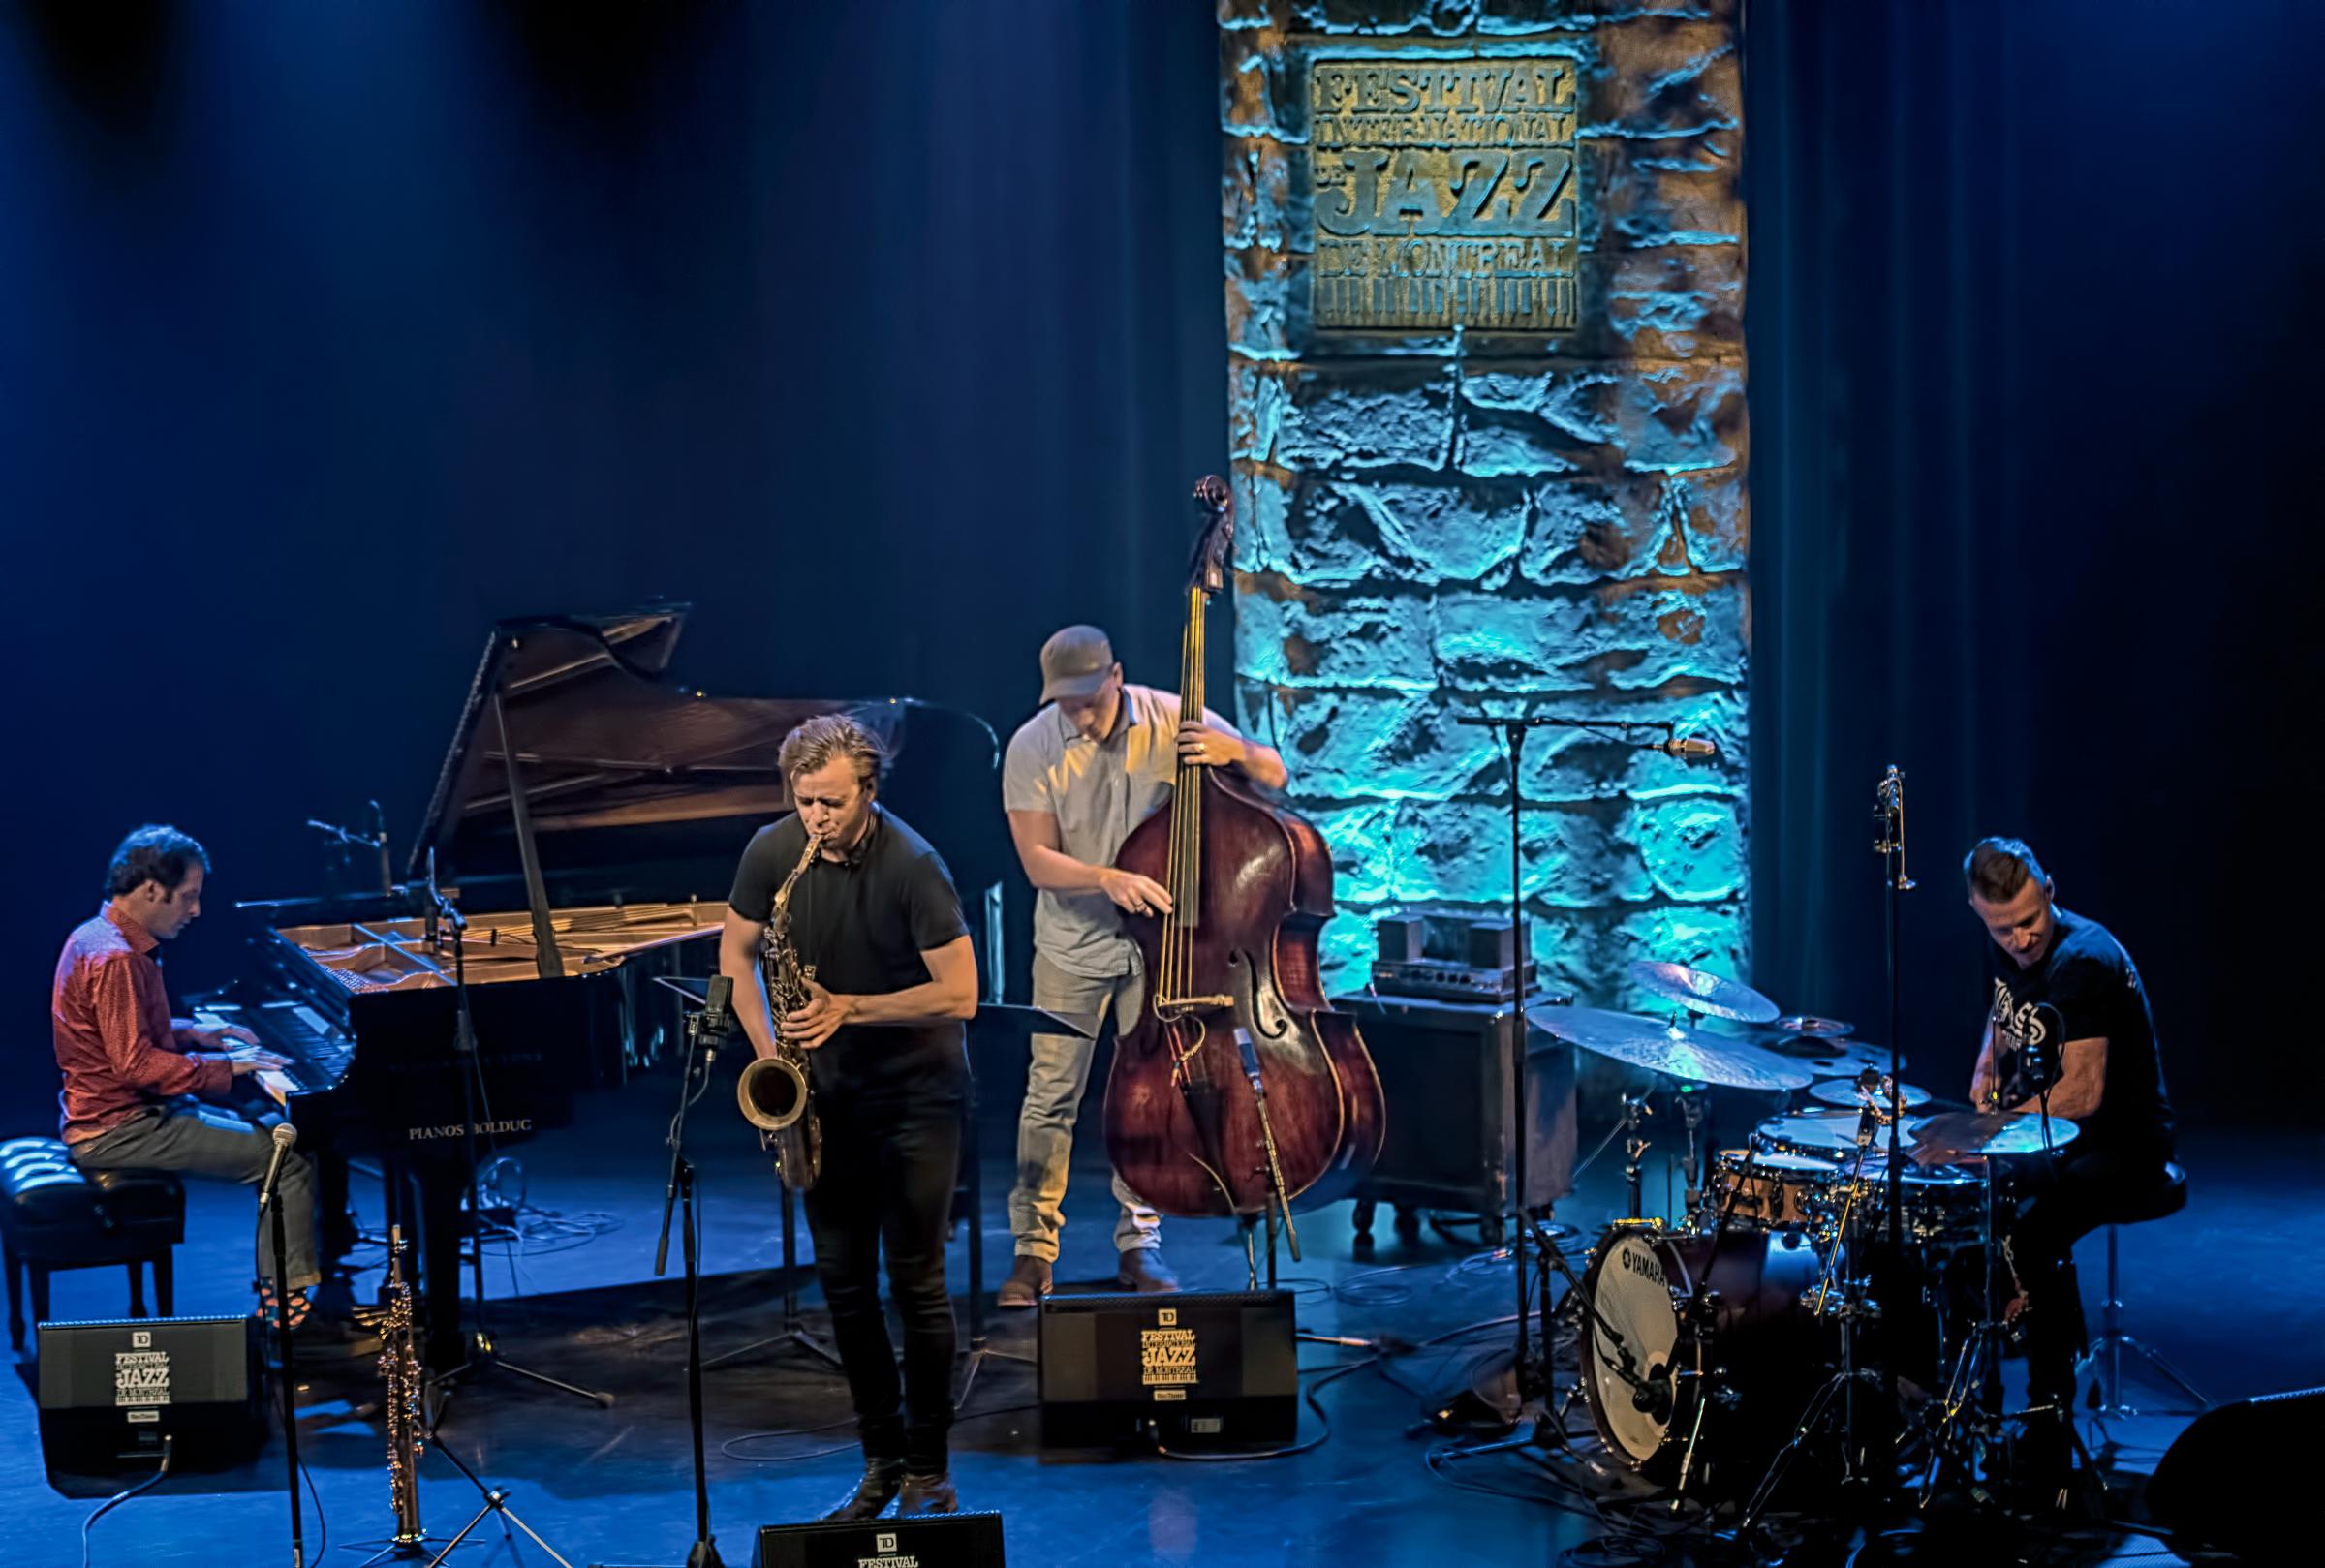 Ivo Neame, Michael Janish, Marius Neset And Anton Eger At The Montreal International Jazz Festival 2018